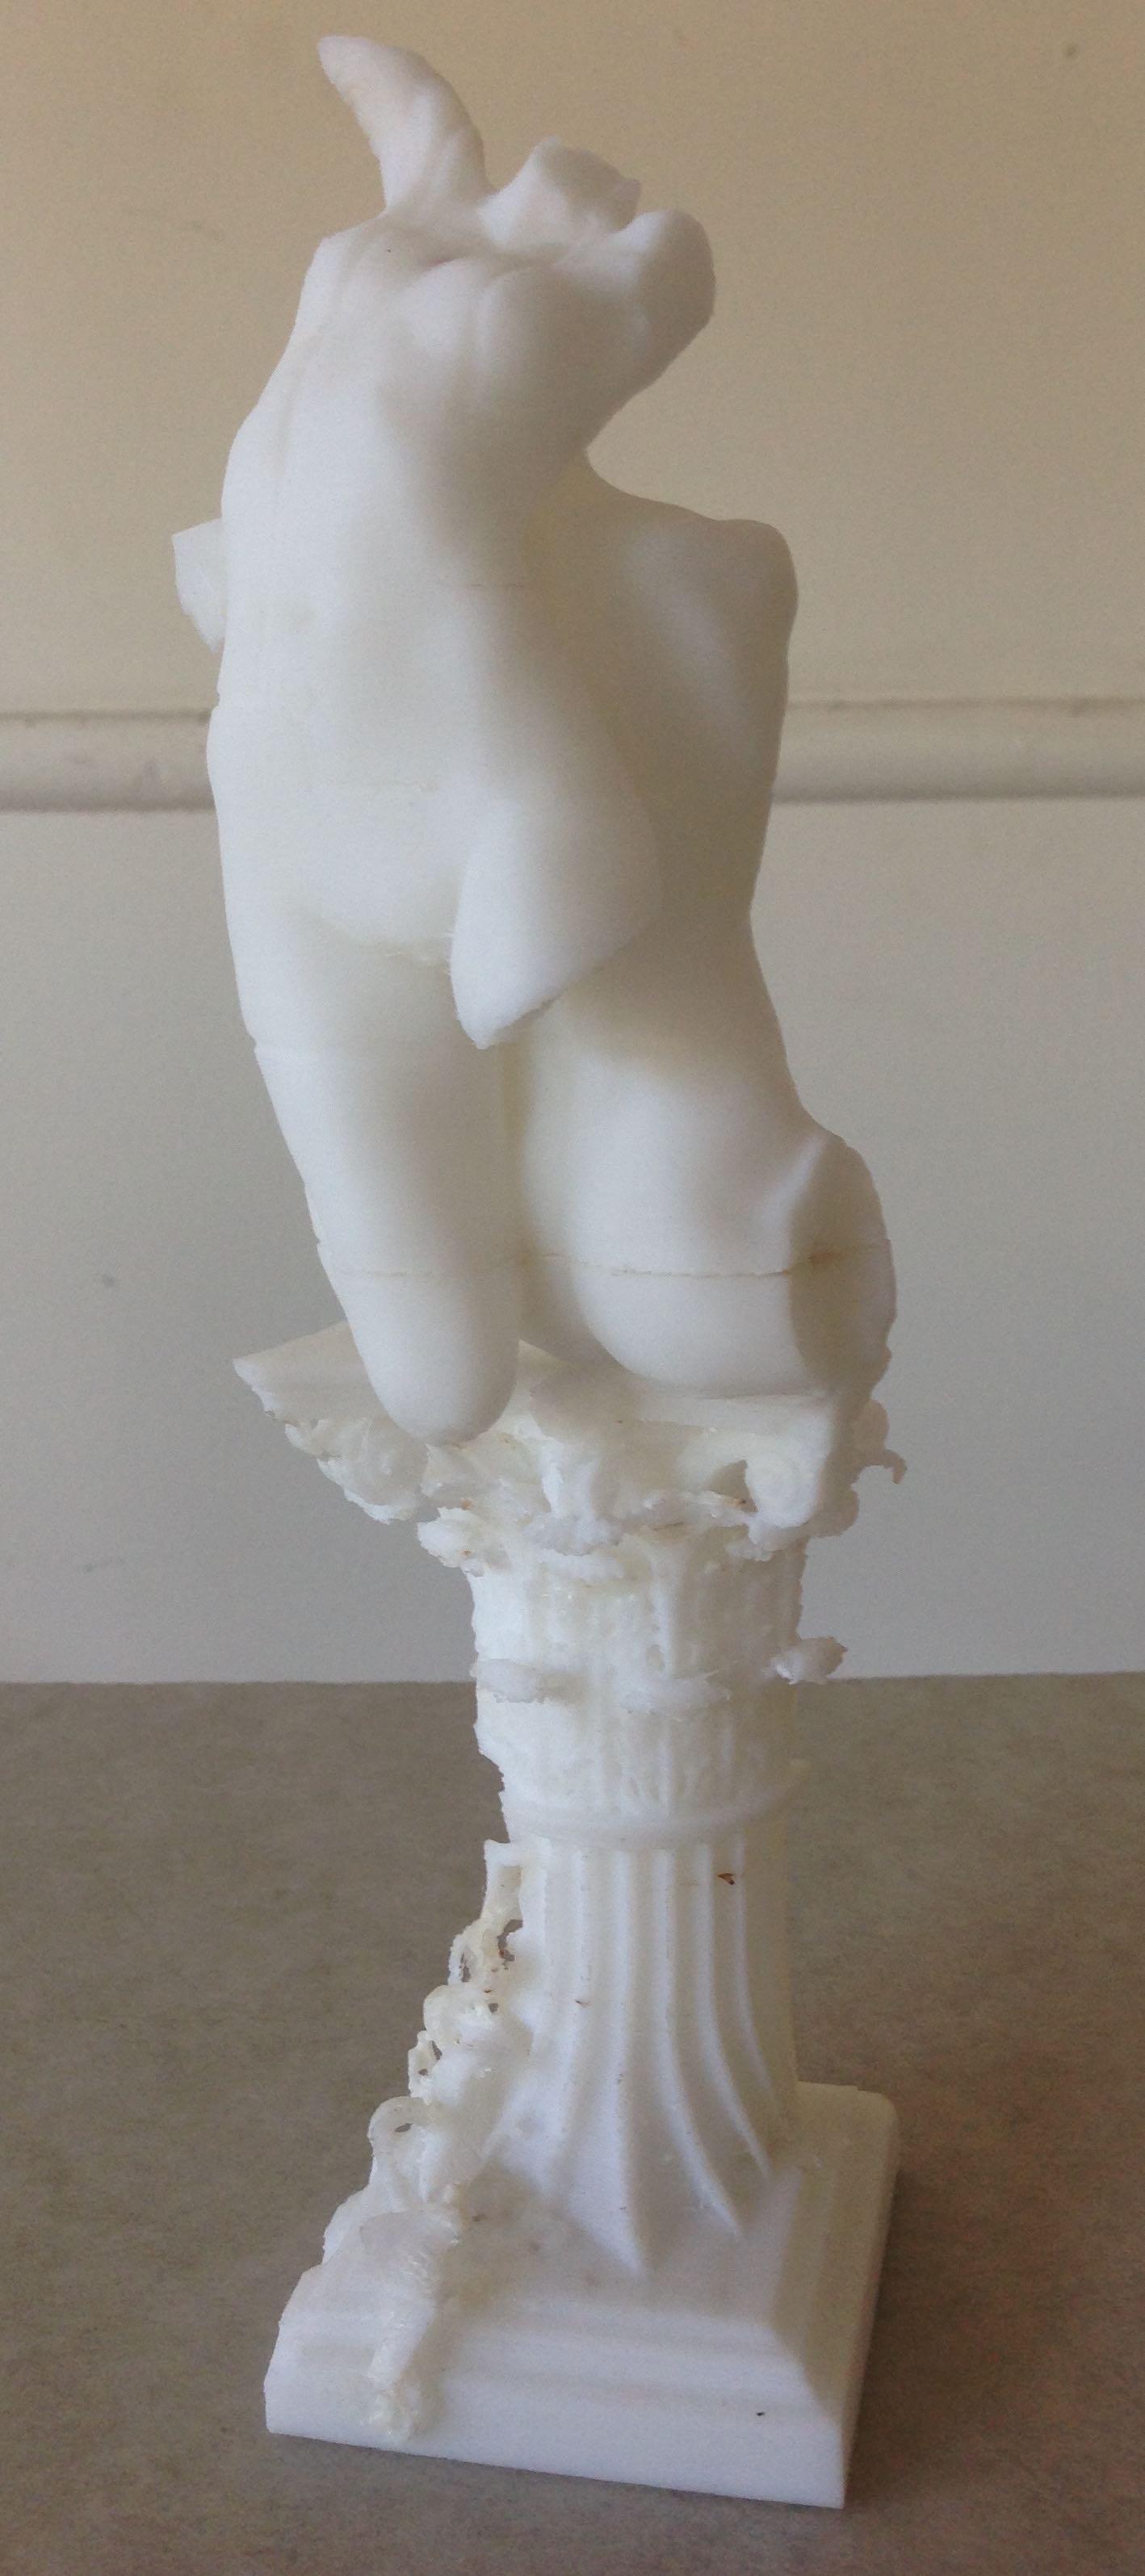 Scott Breton DNA to Digital Sculpture 3D Print1.jpg